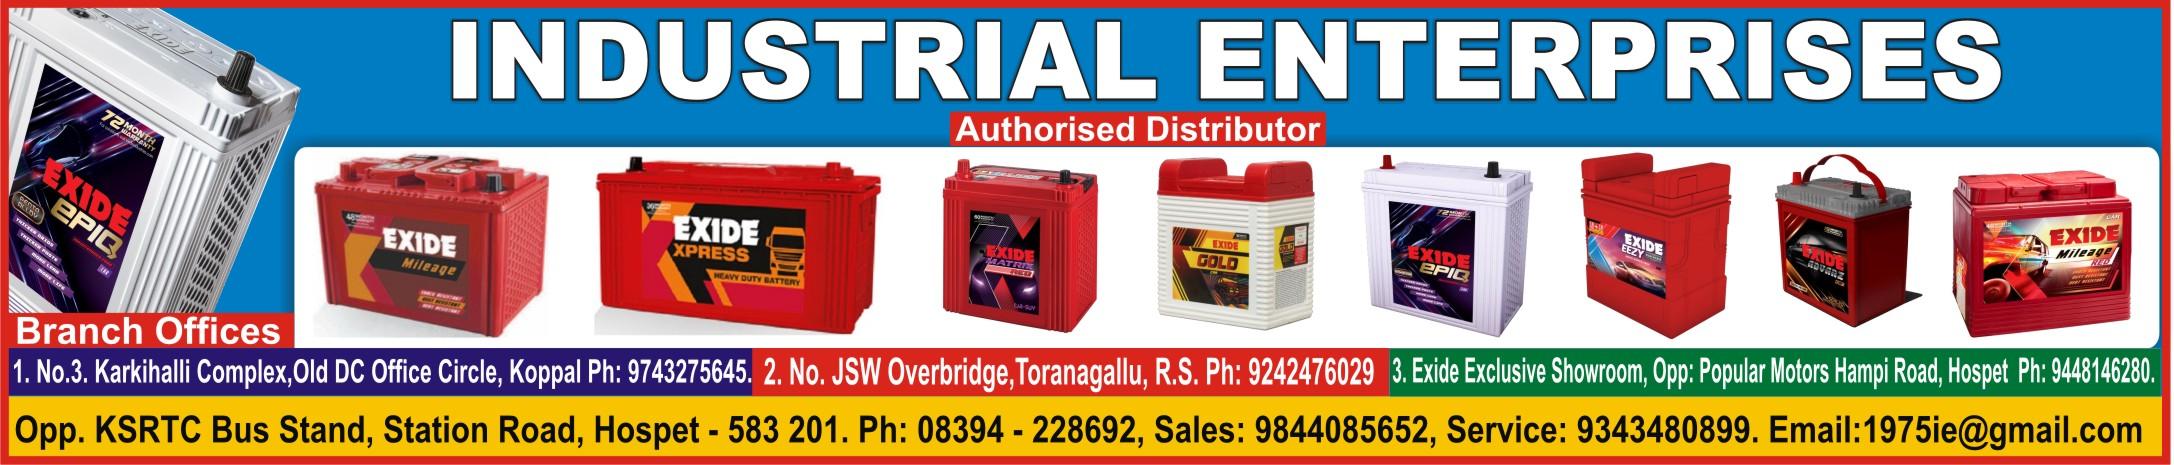 Industrial Enterprises